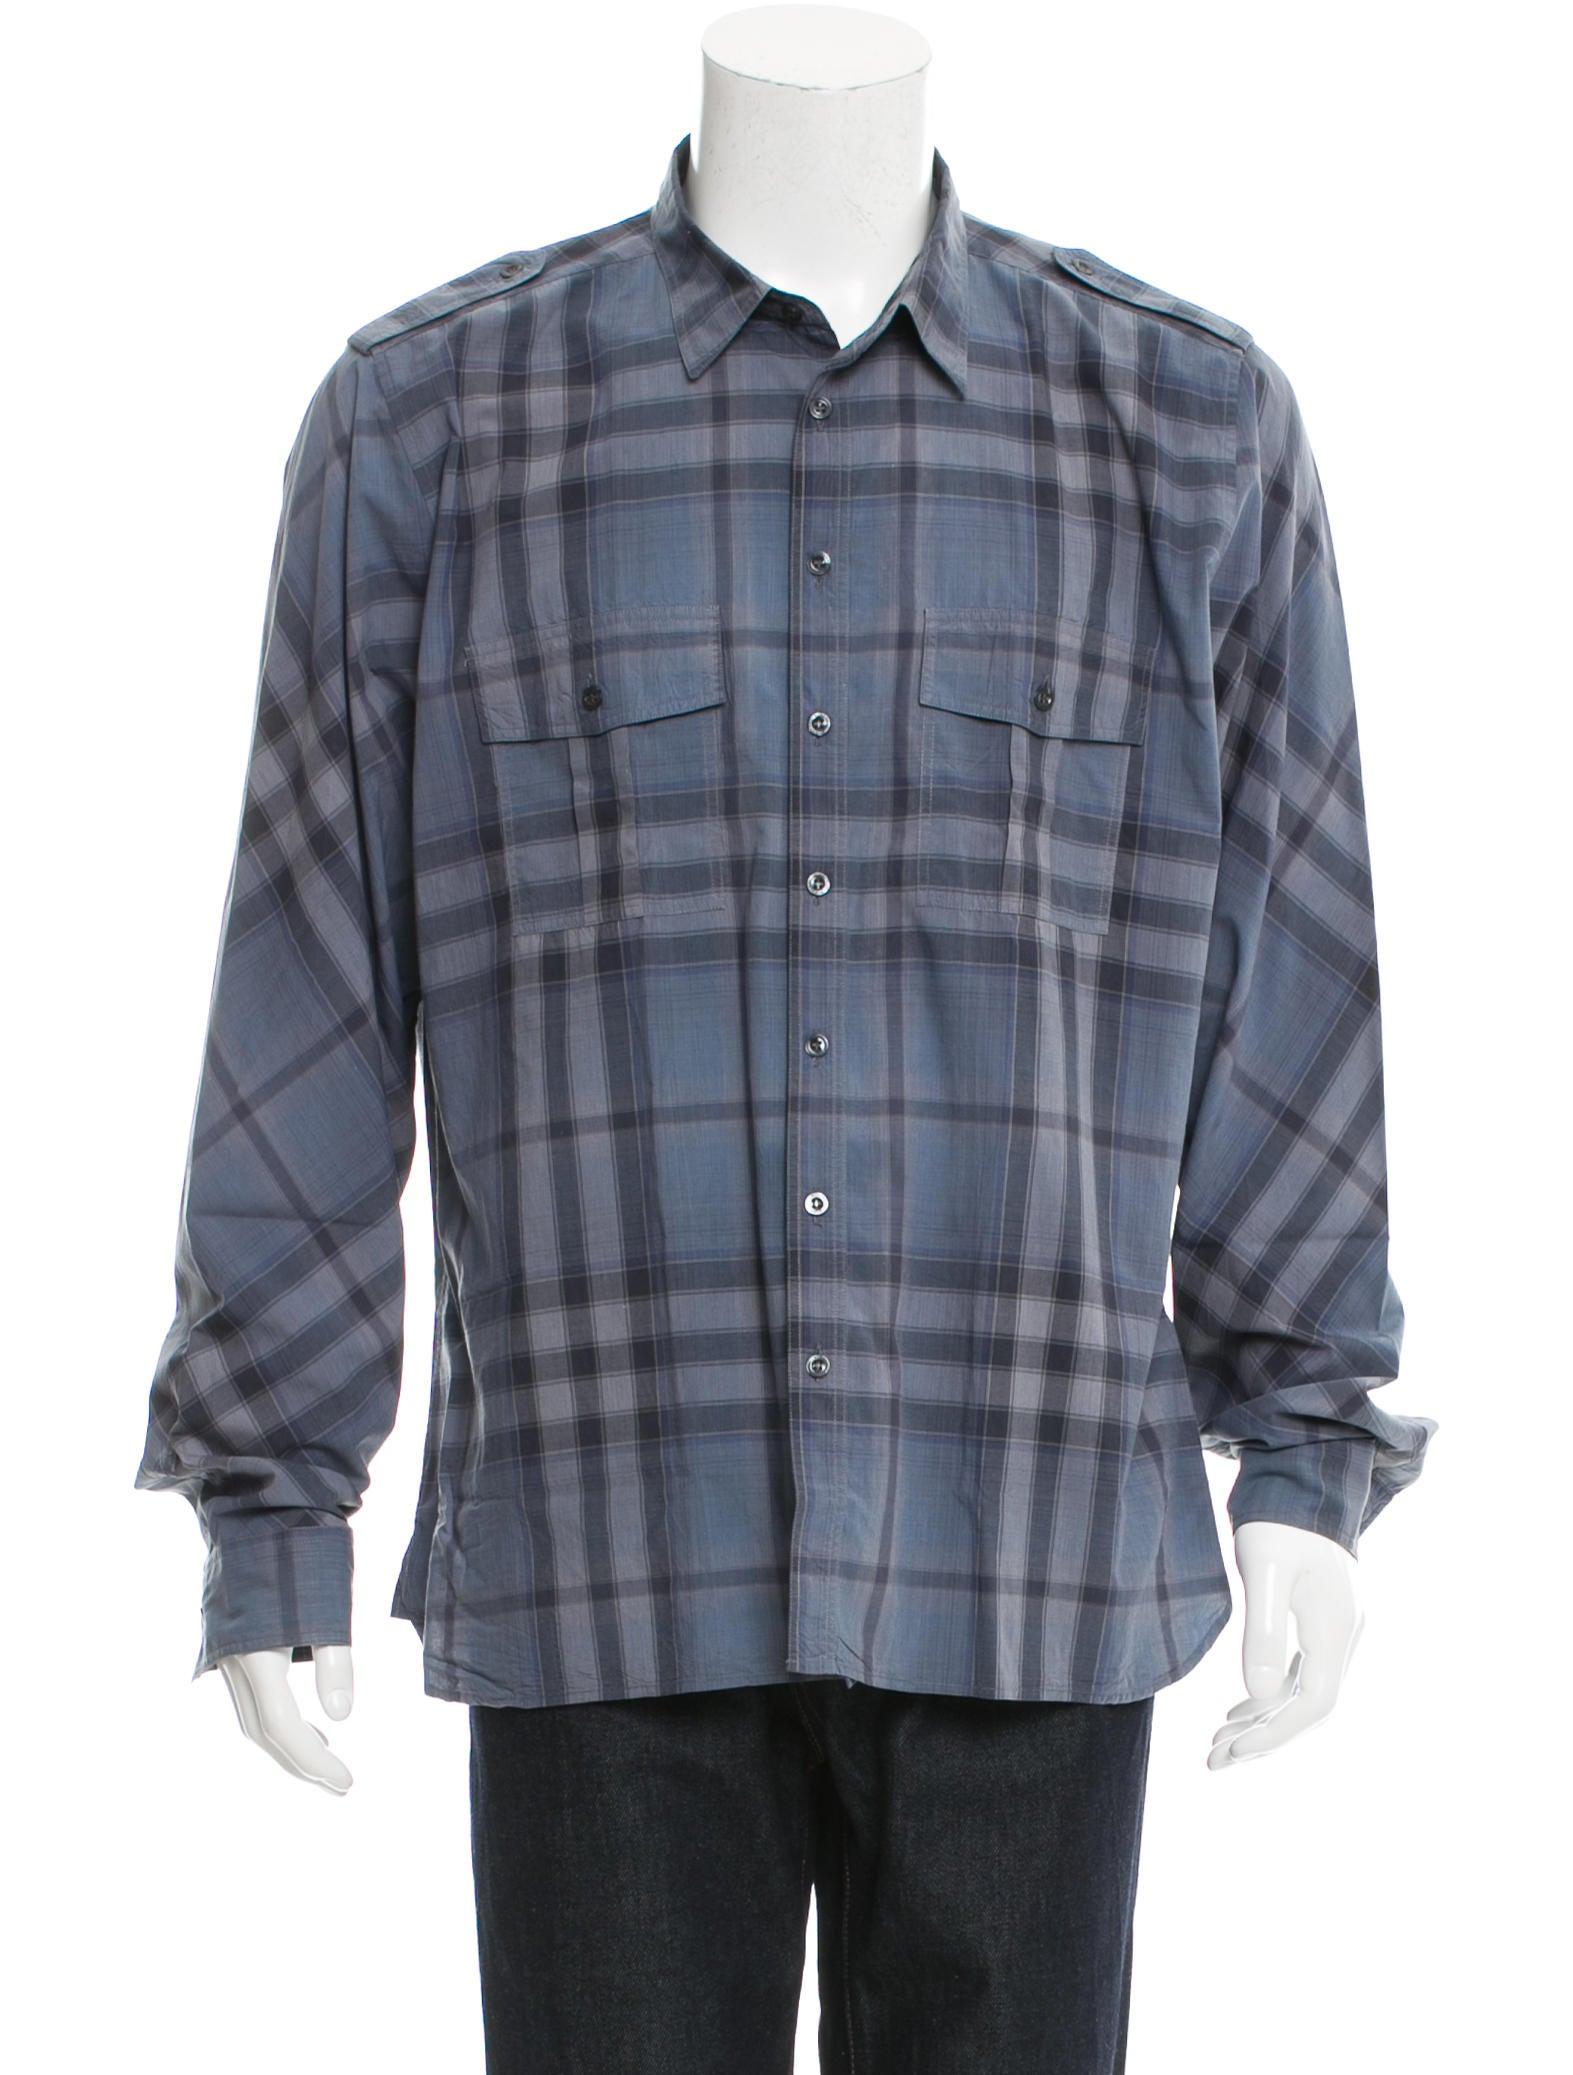 Burberry London Plaid Military Shirt Clothing